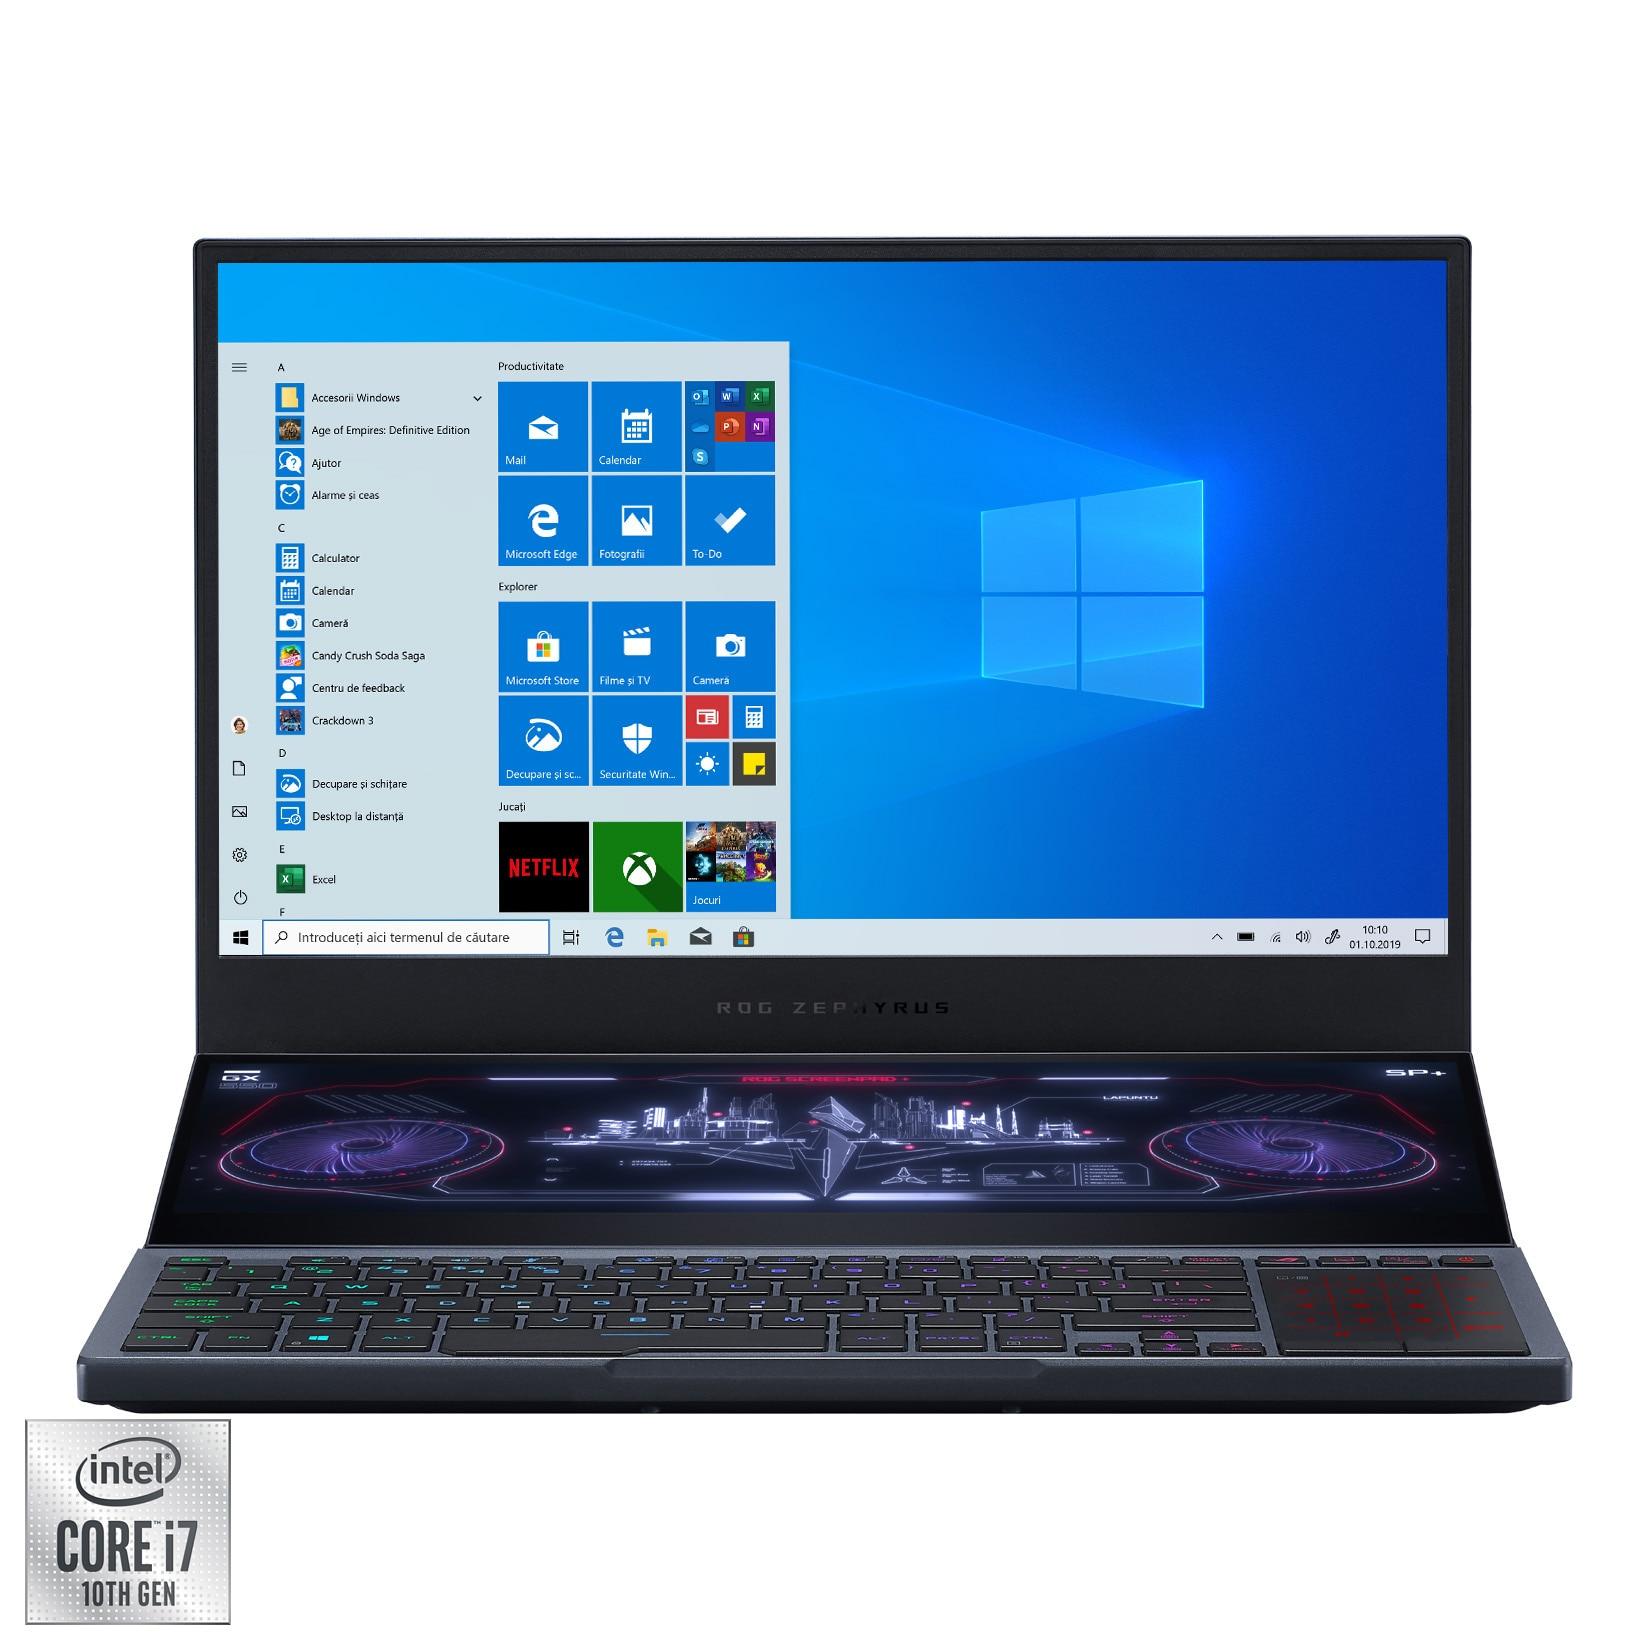 "Fotografie Laptop Gaming ASUS ROG Zephyrus Duo 15 GX550LXS cu procesor Intel® Core™ i7-10875H pana la 5.10 GHz, 15.6"", Full HD, 300Hz, 32GB, 1TB SSD, NVIDIA® GeForce® RTX 2080 SUPER™ Max-Q Design 8GB, Windows 10 Pro, Gunmetal Gray"